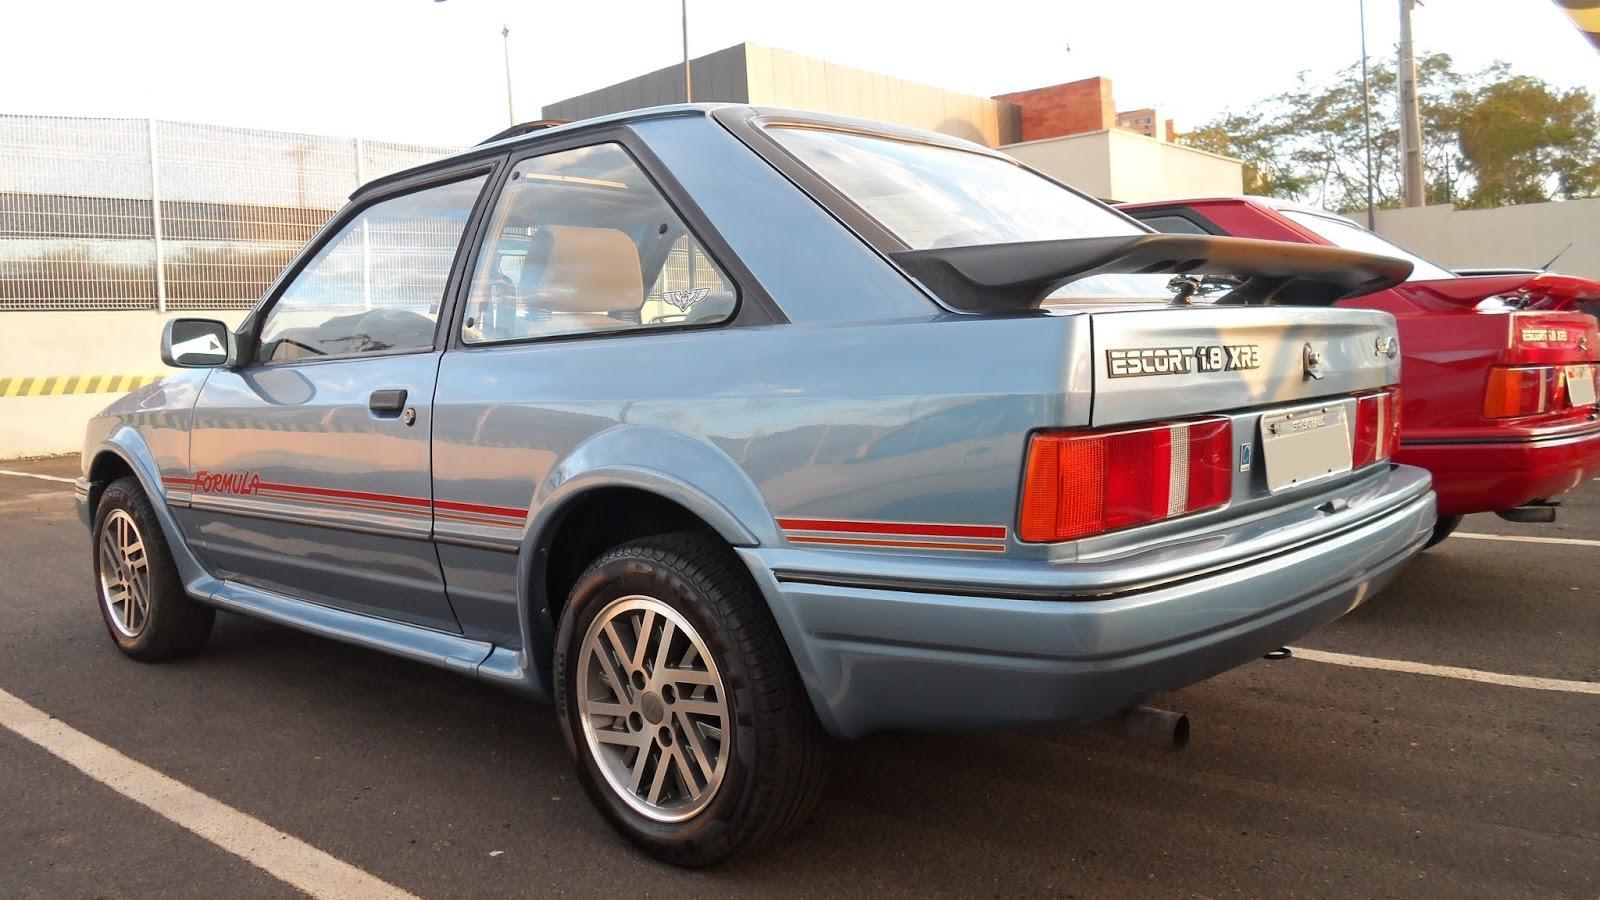 ESCORT XR3 FORMULA 1991